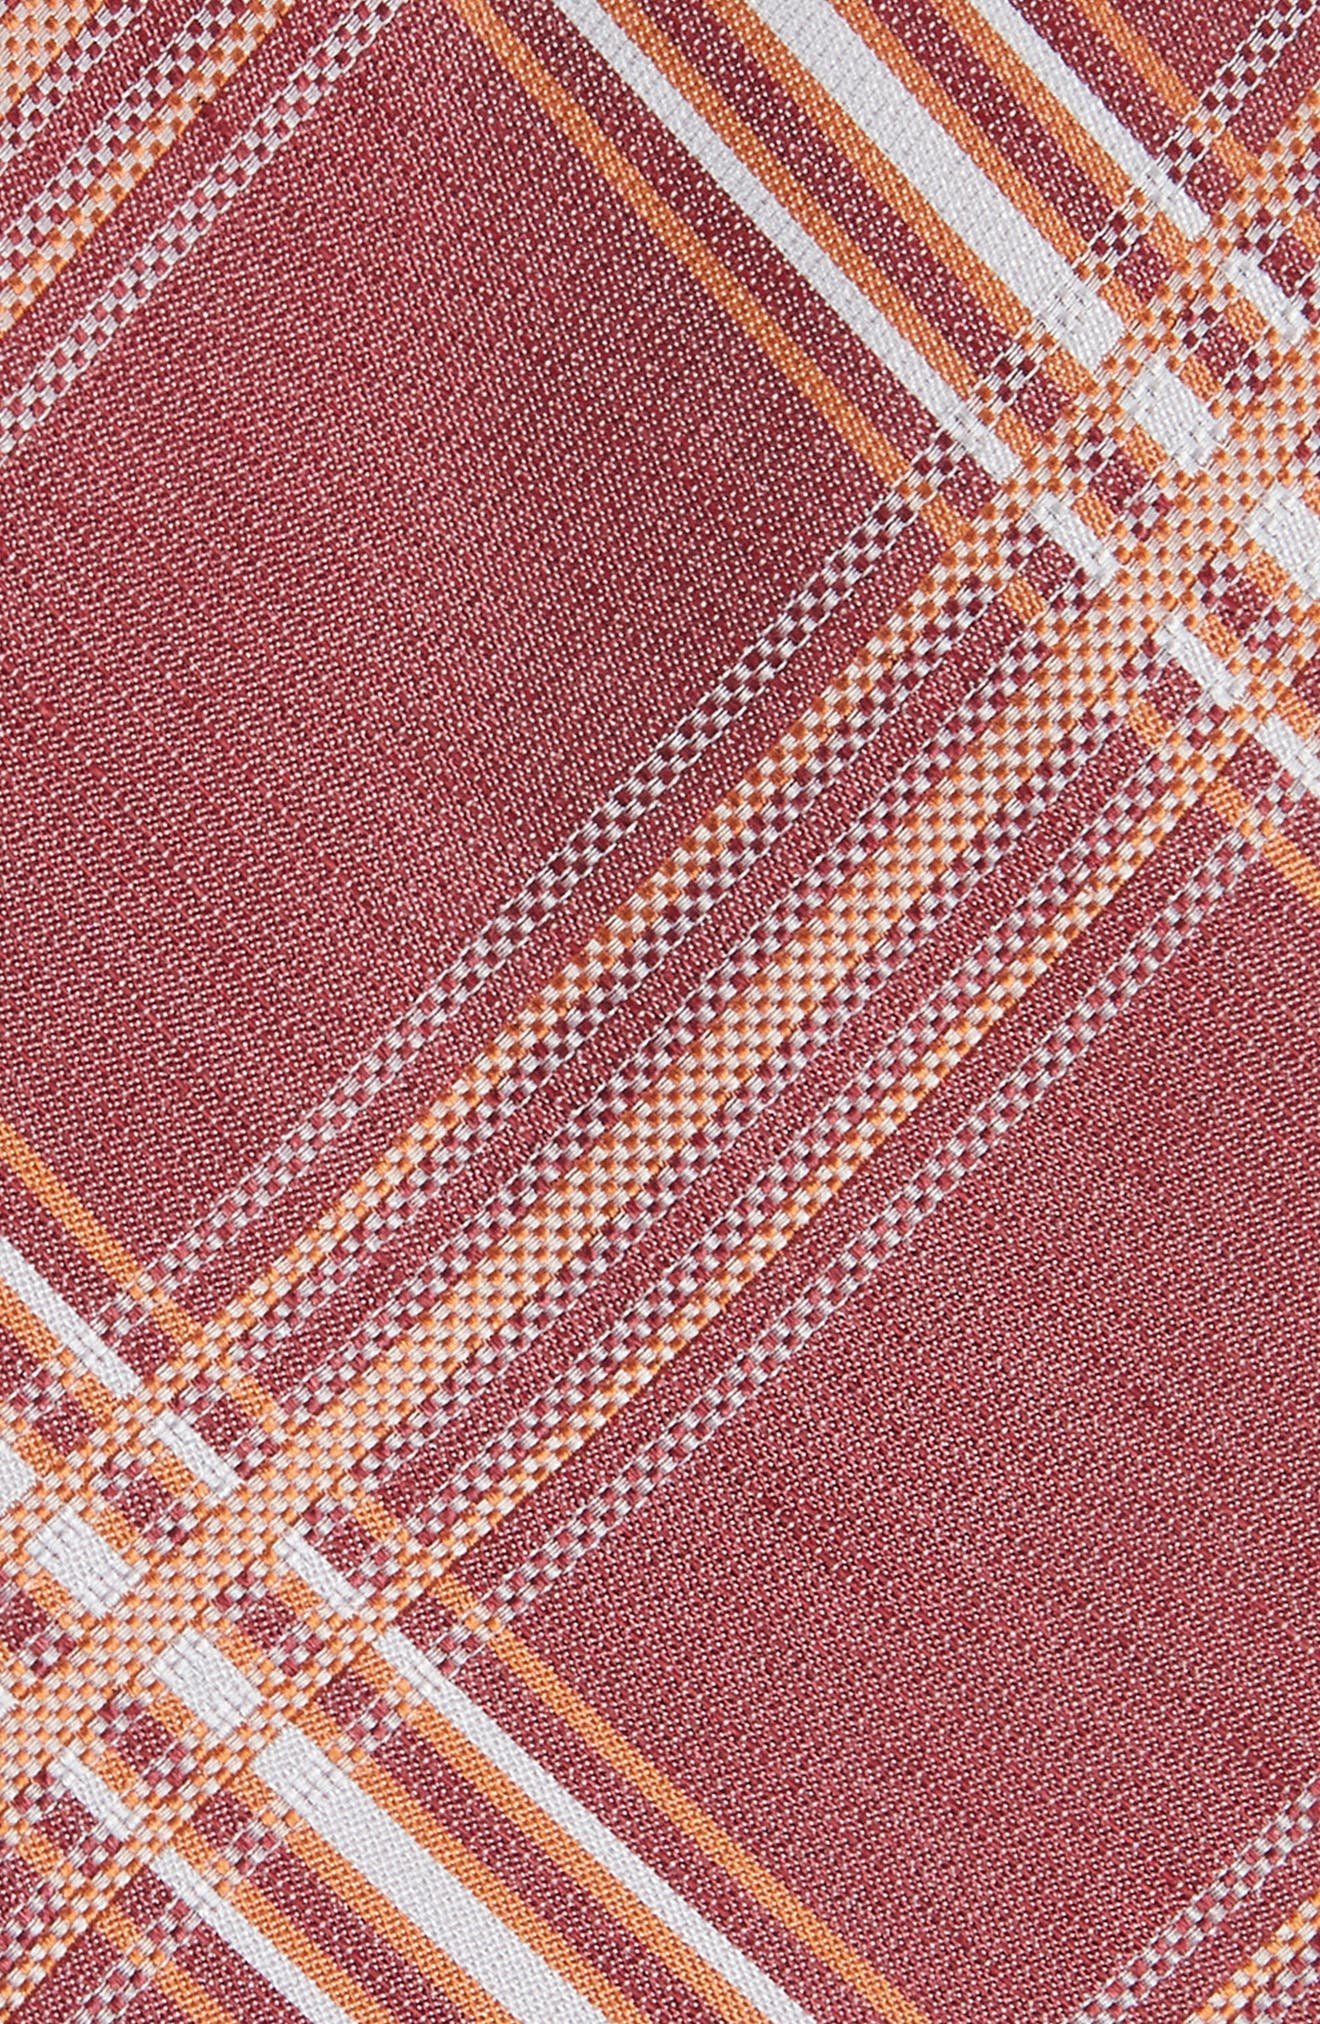 KP Plaid Silk & Linen Tie,                             Alternate thumbnail 2, color,                             MARSALA